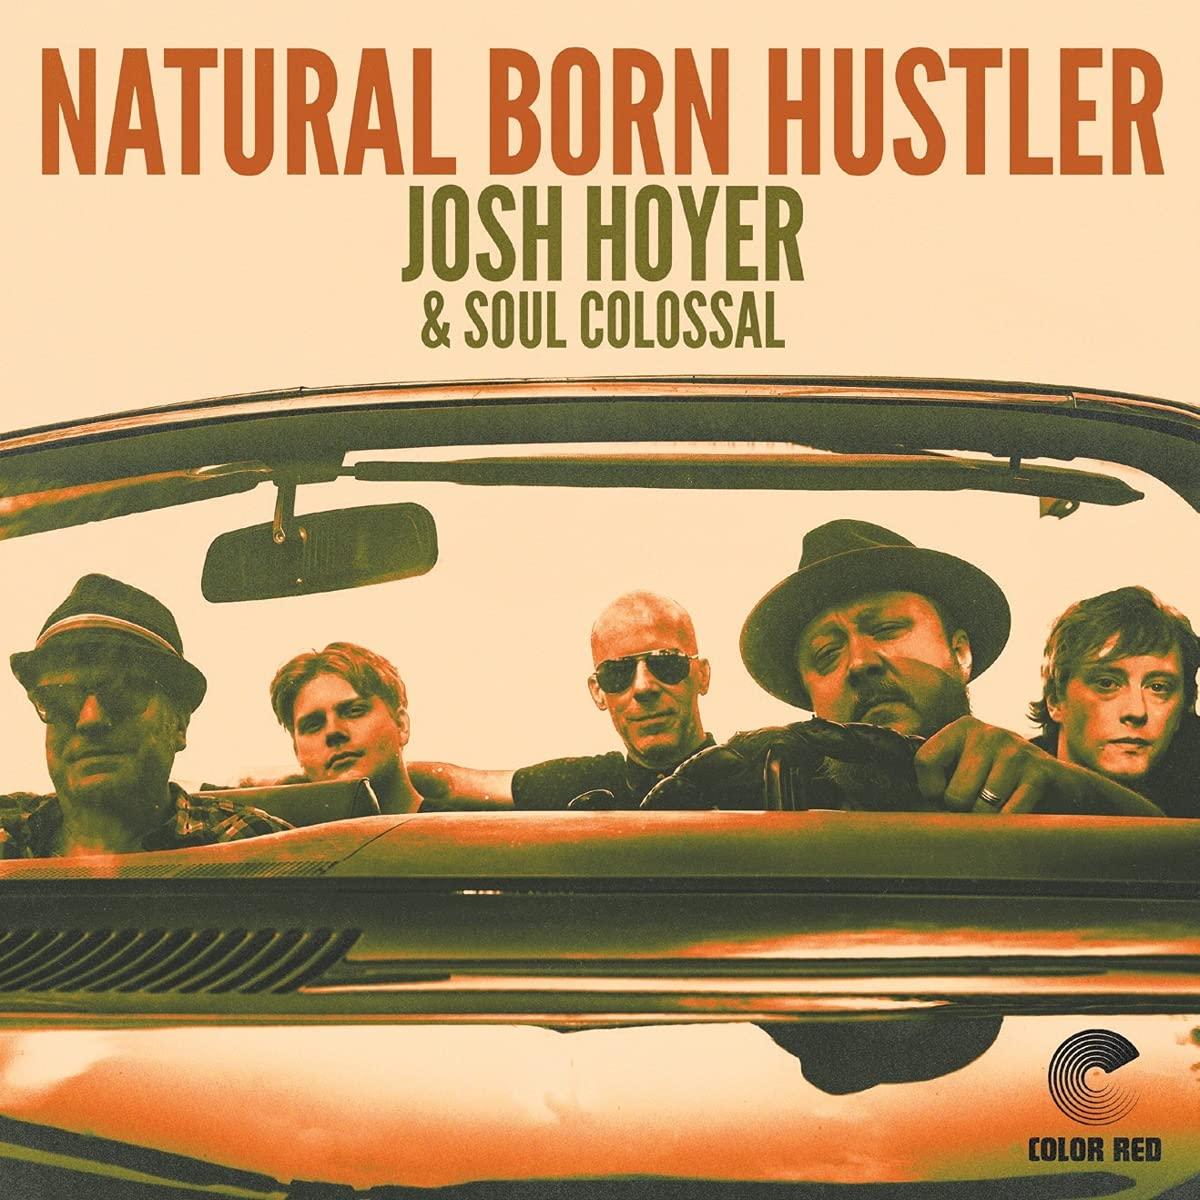 Josh Hoyer & Soul Colossal – Natural Born Hustler (2021) [FLAC]